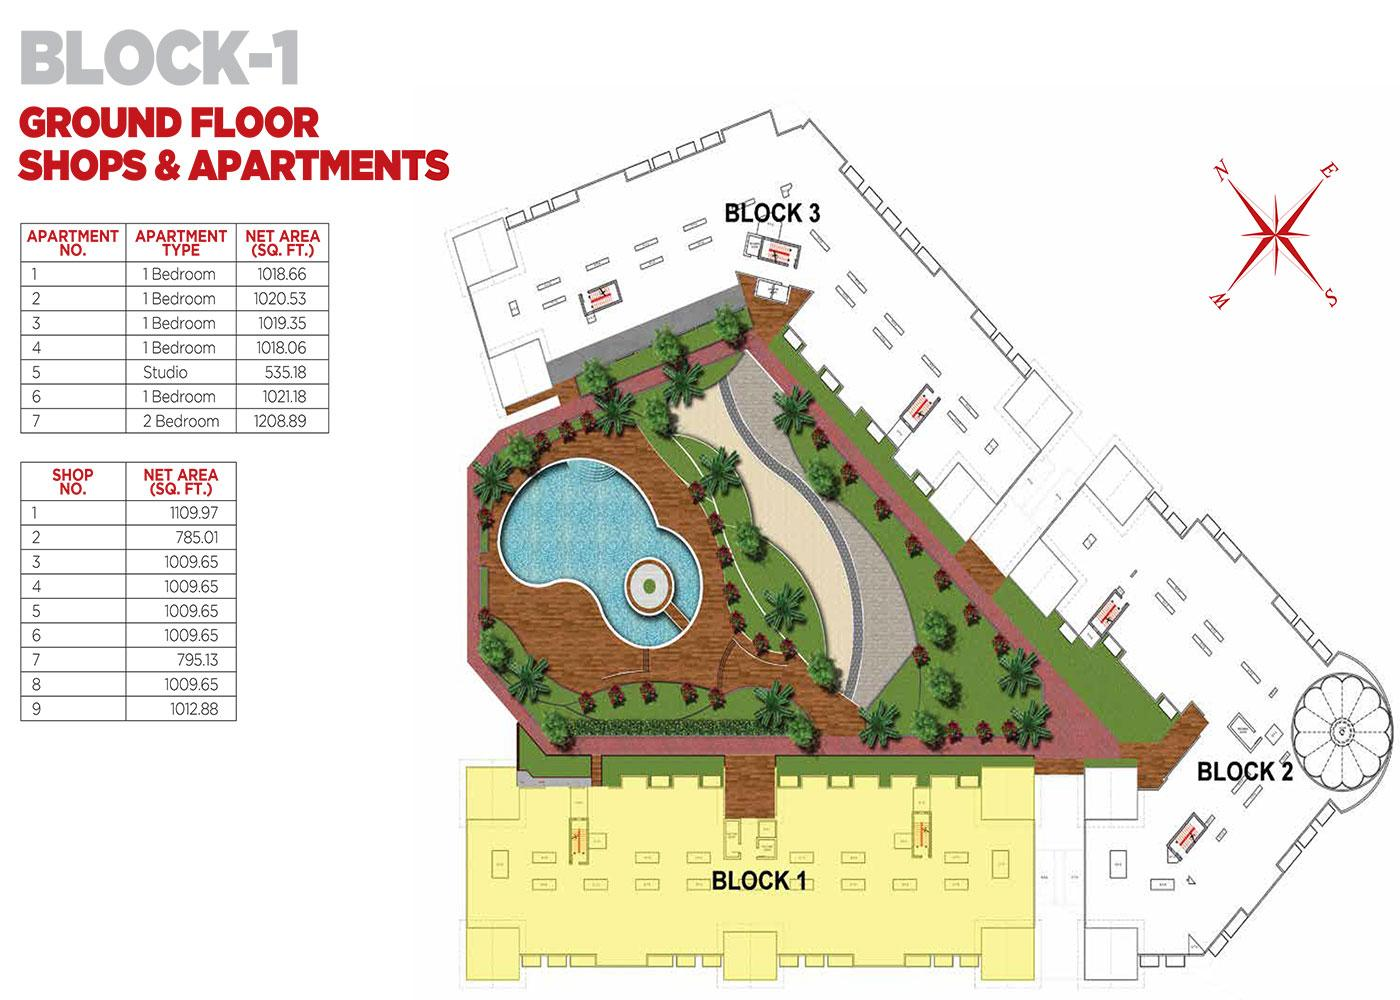 Ground Floor Apartments Block 1